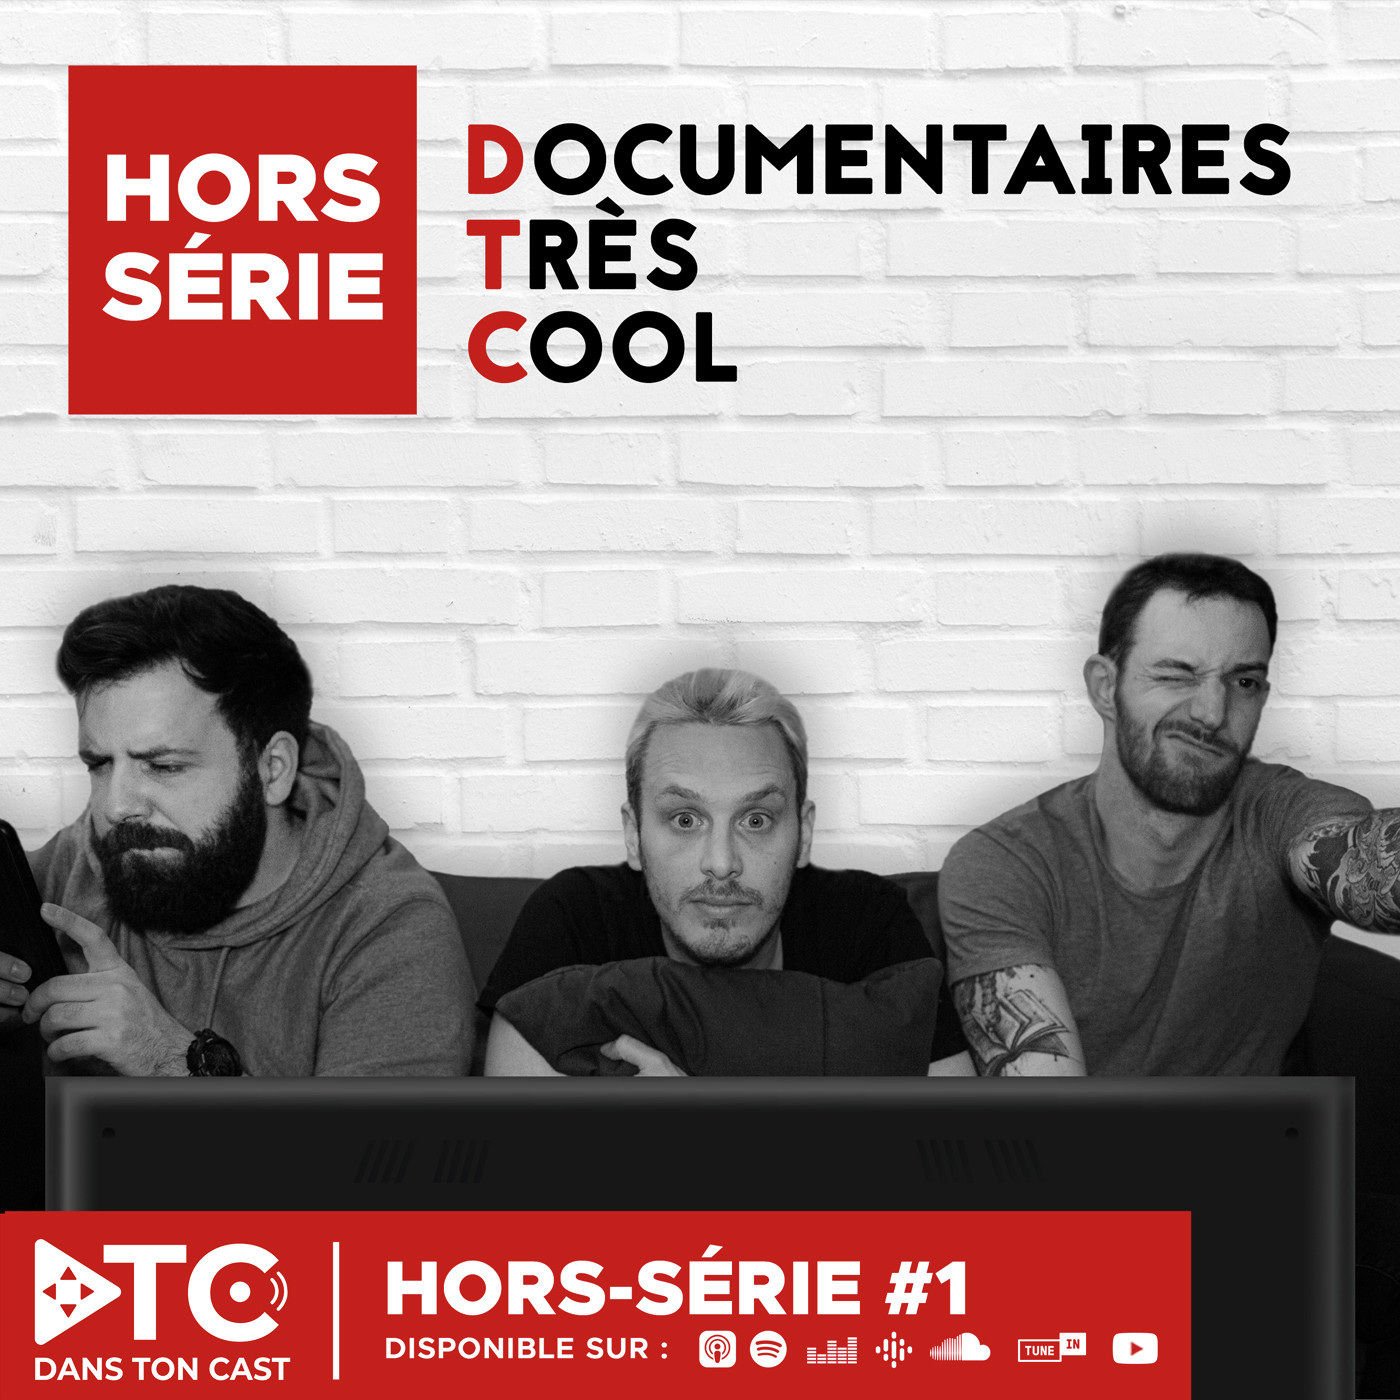 S1E4 - Hors-Série n°1 - Documentaires Très Cool